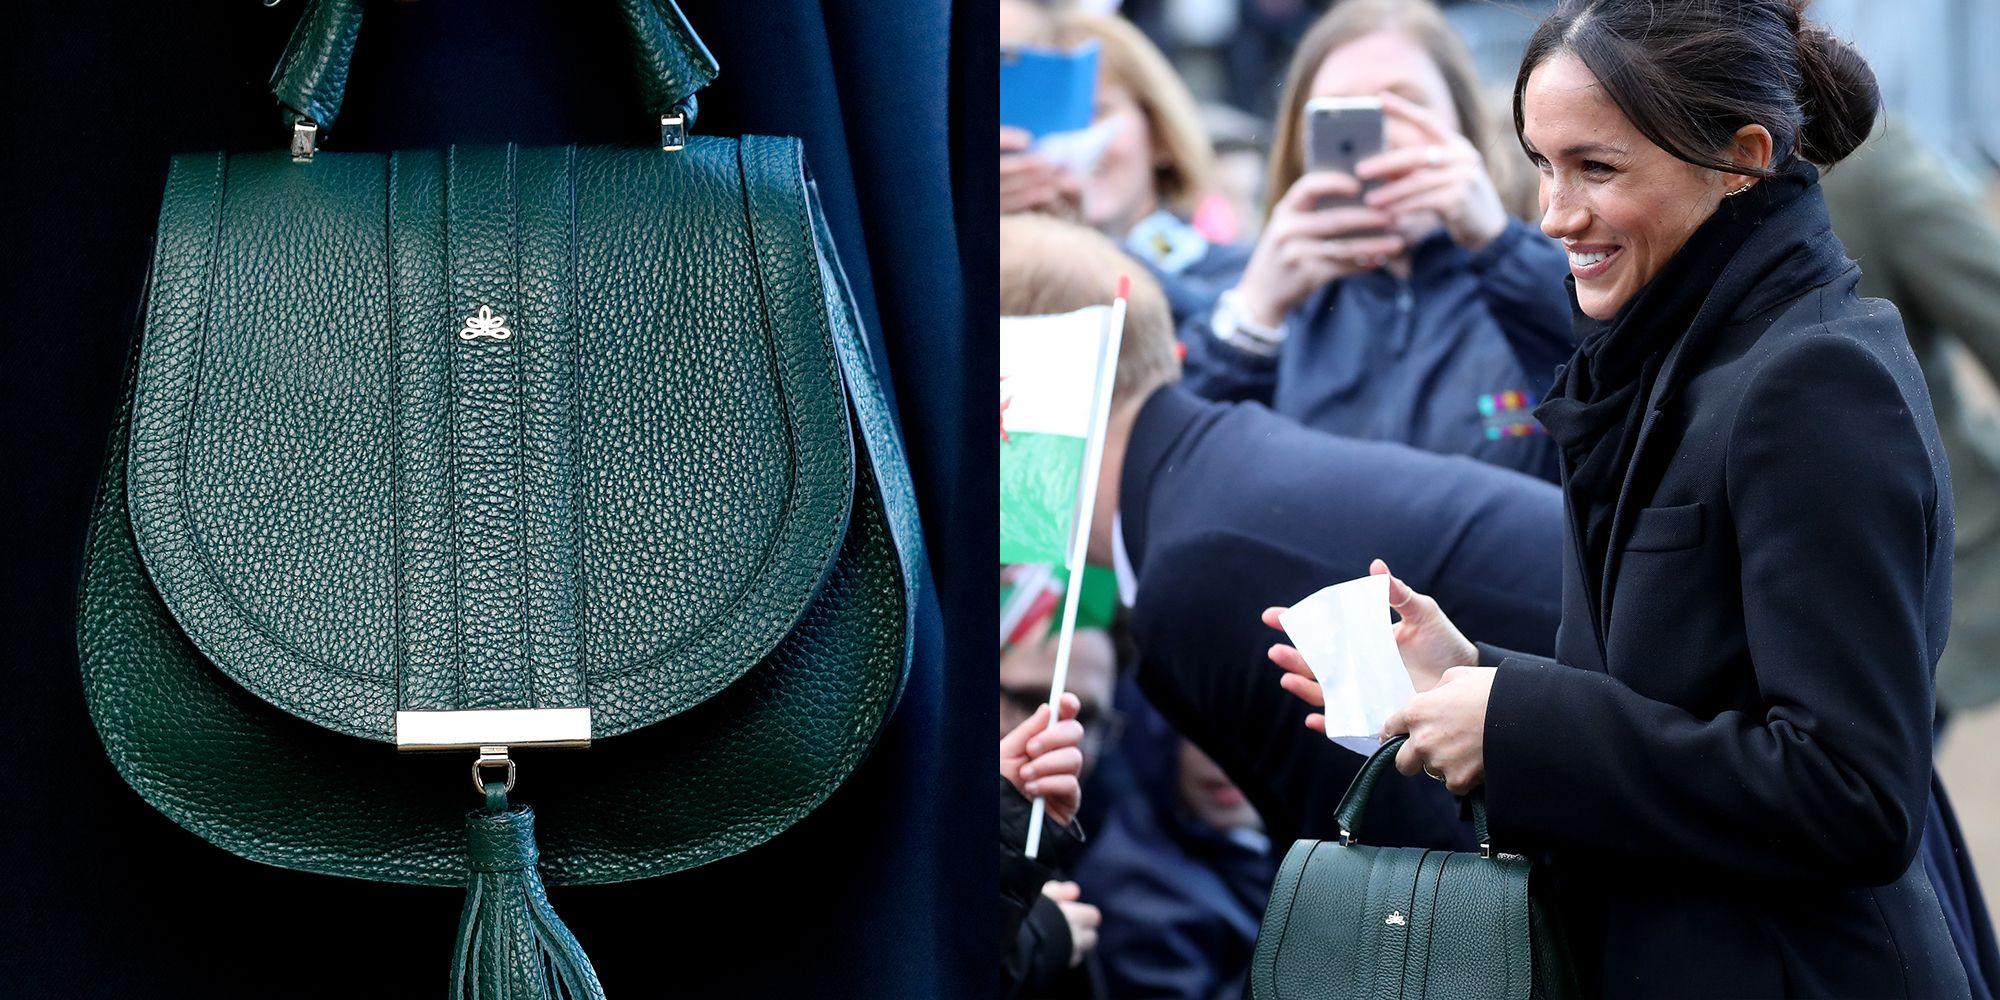 Princess Beatrice Camilla Parker Bowles More Royal Family Members